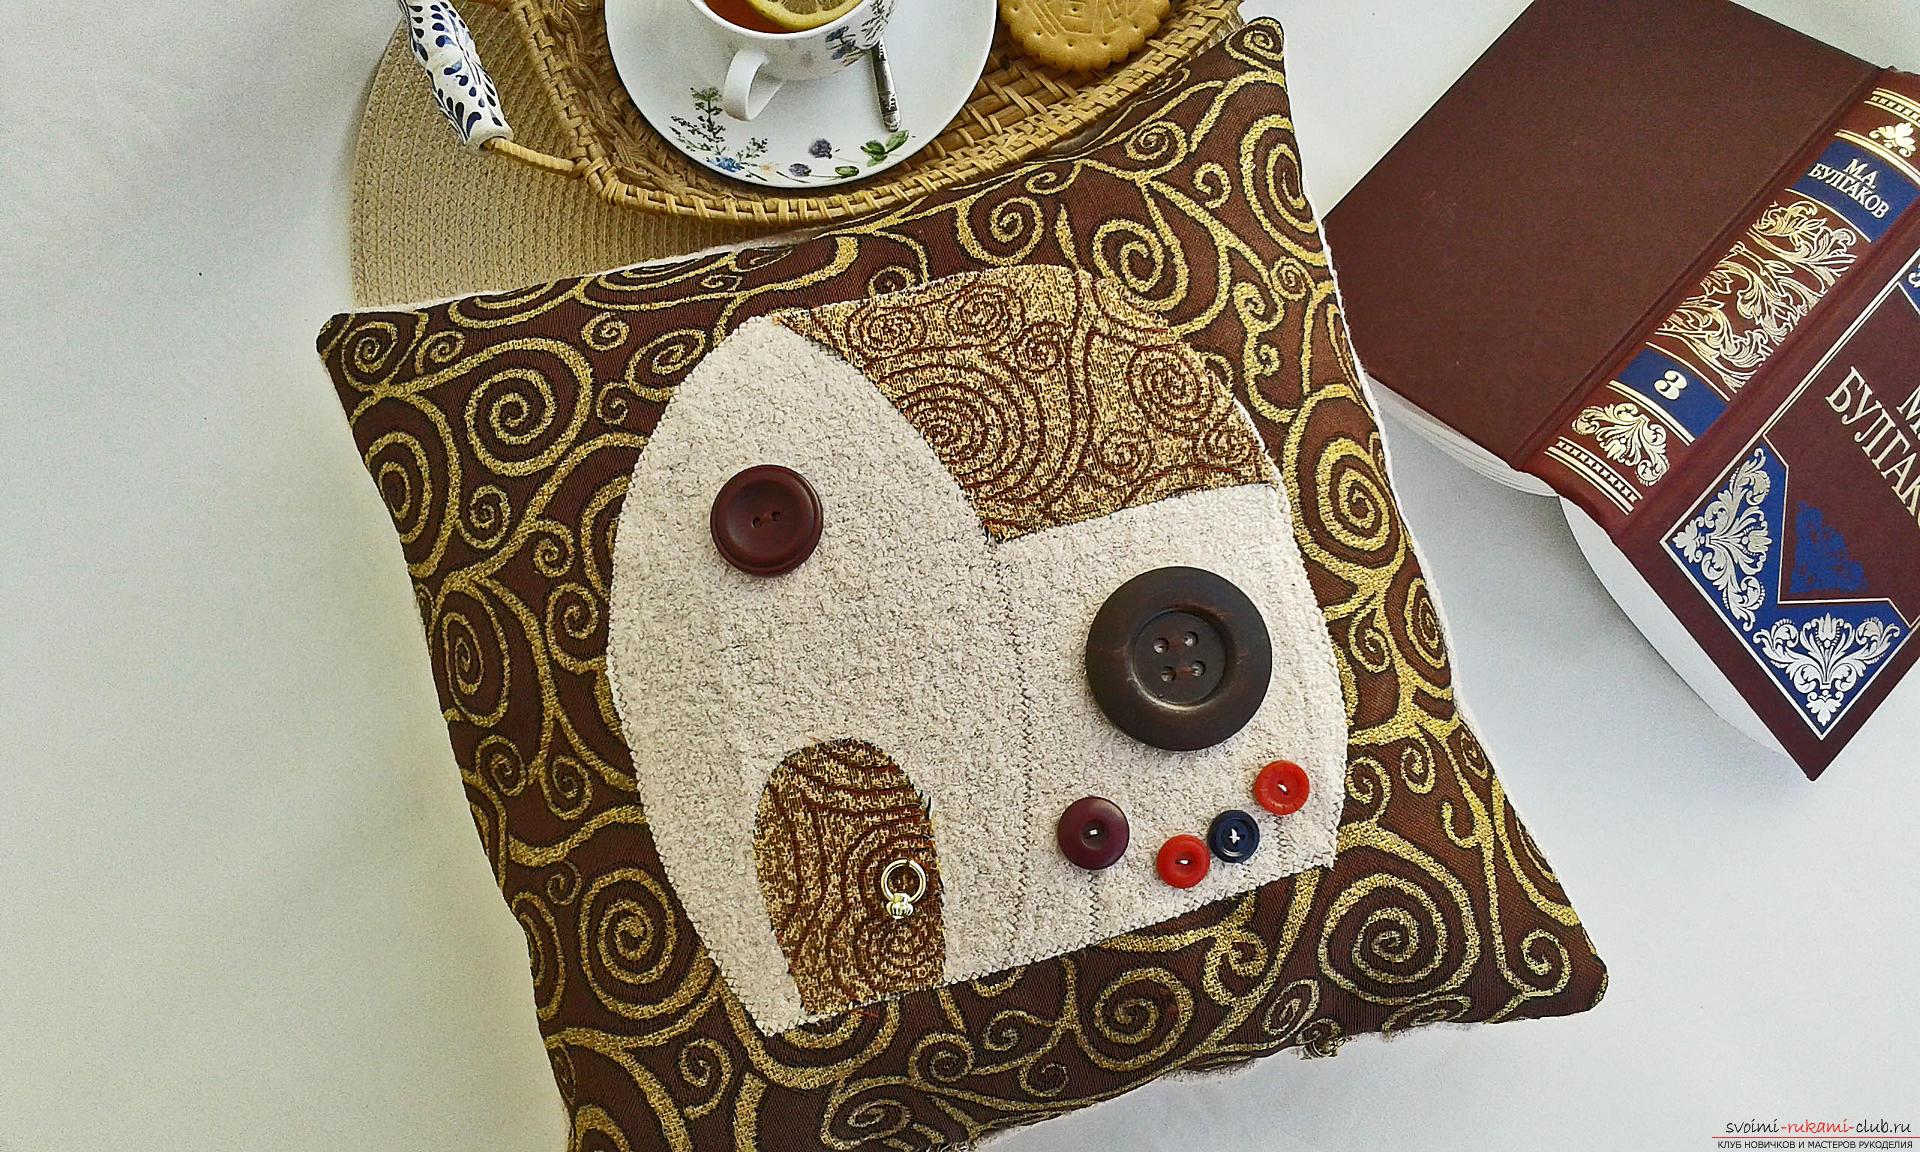 Декоративные подушки своими руками из ткани фото фото 705